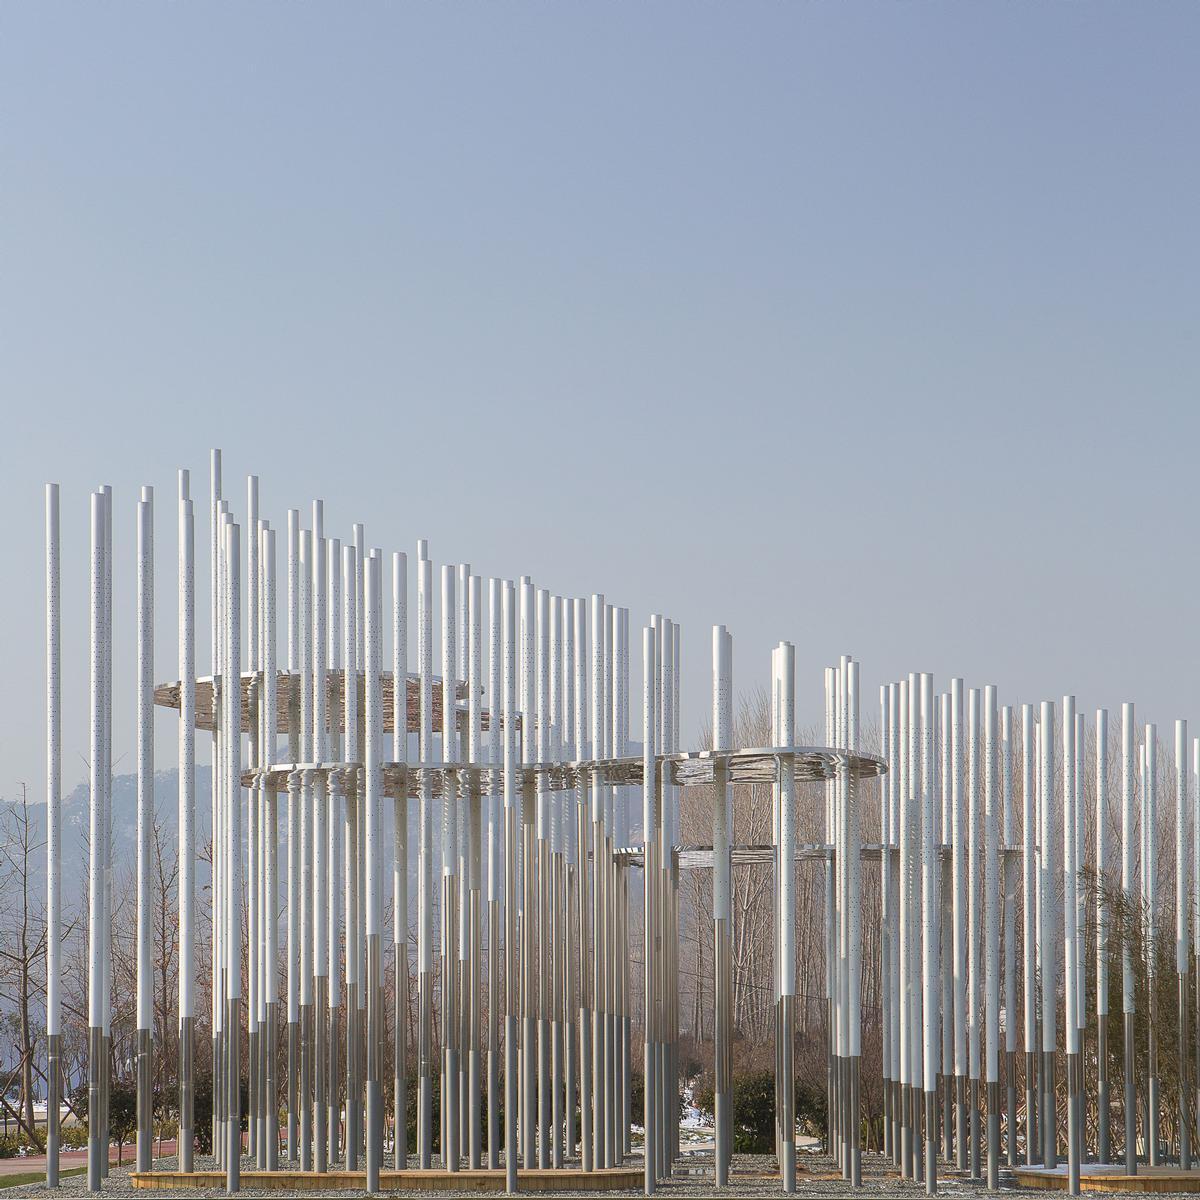 The installation comprises 200 steel poles / Aurelien Chen